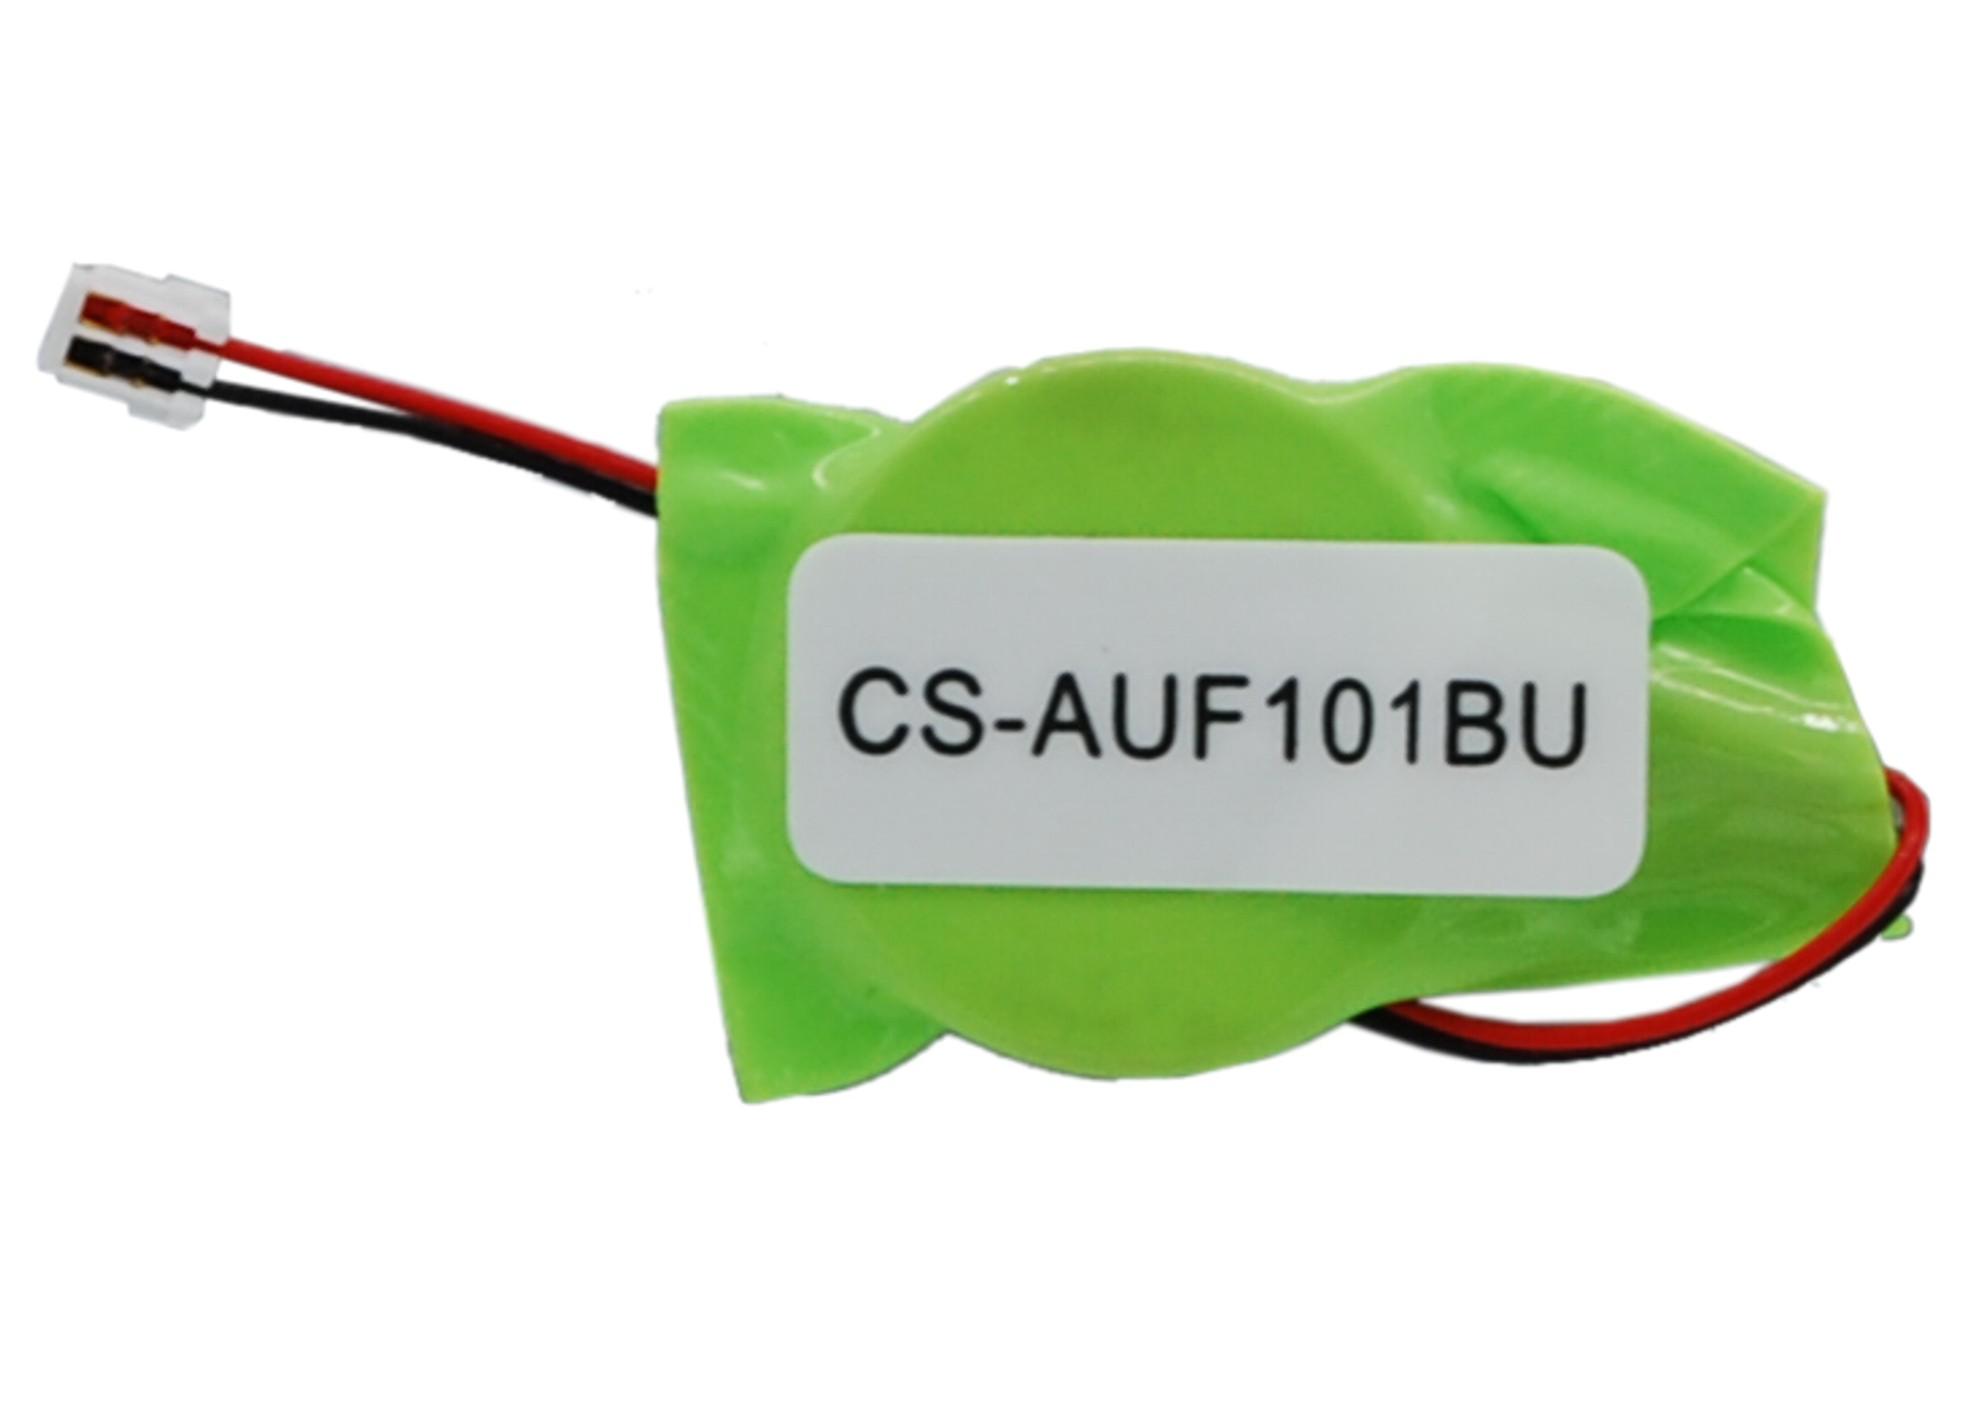 Cameron Sino baterie cmos pro ASUS Eee Pad Transformer TF101-1B025A 3V Li-ion 40mAh zelená - neoriginální